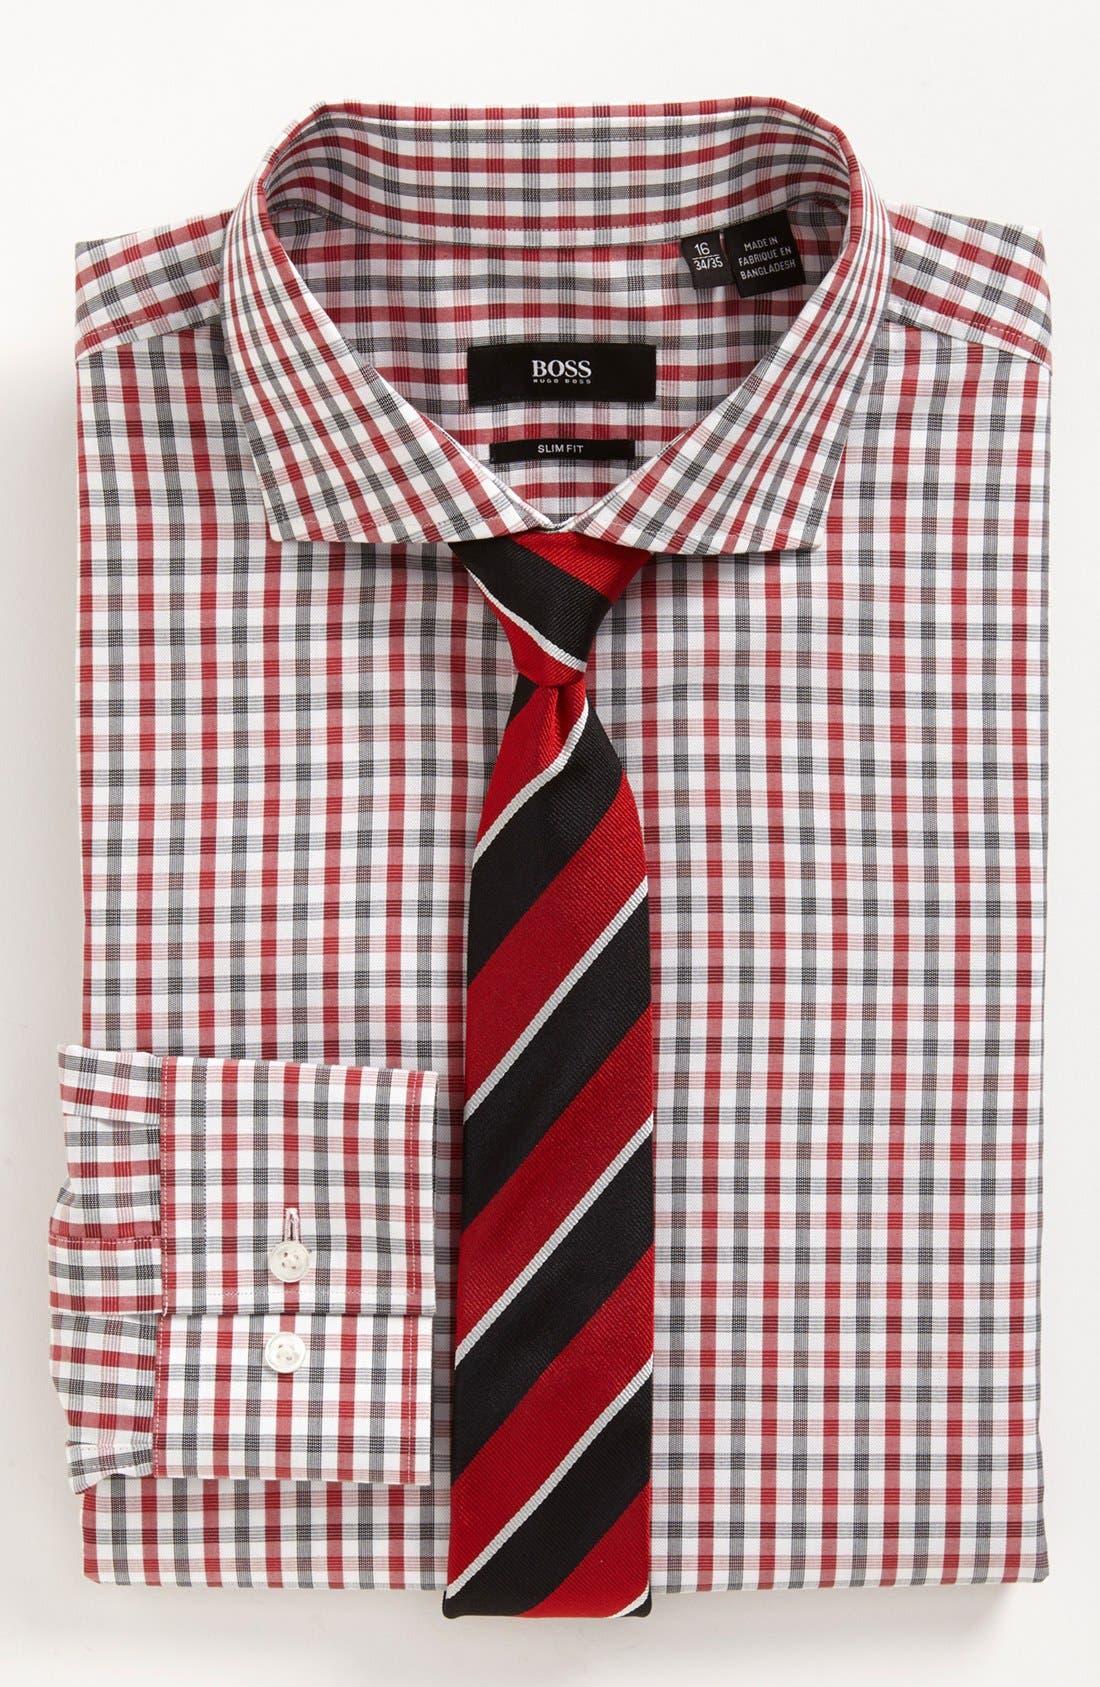 BOSS Black Dress Shirt & Tie,                             Main thumbnail 1, color,                             Red